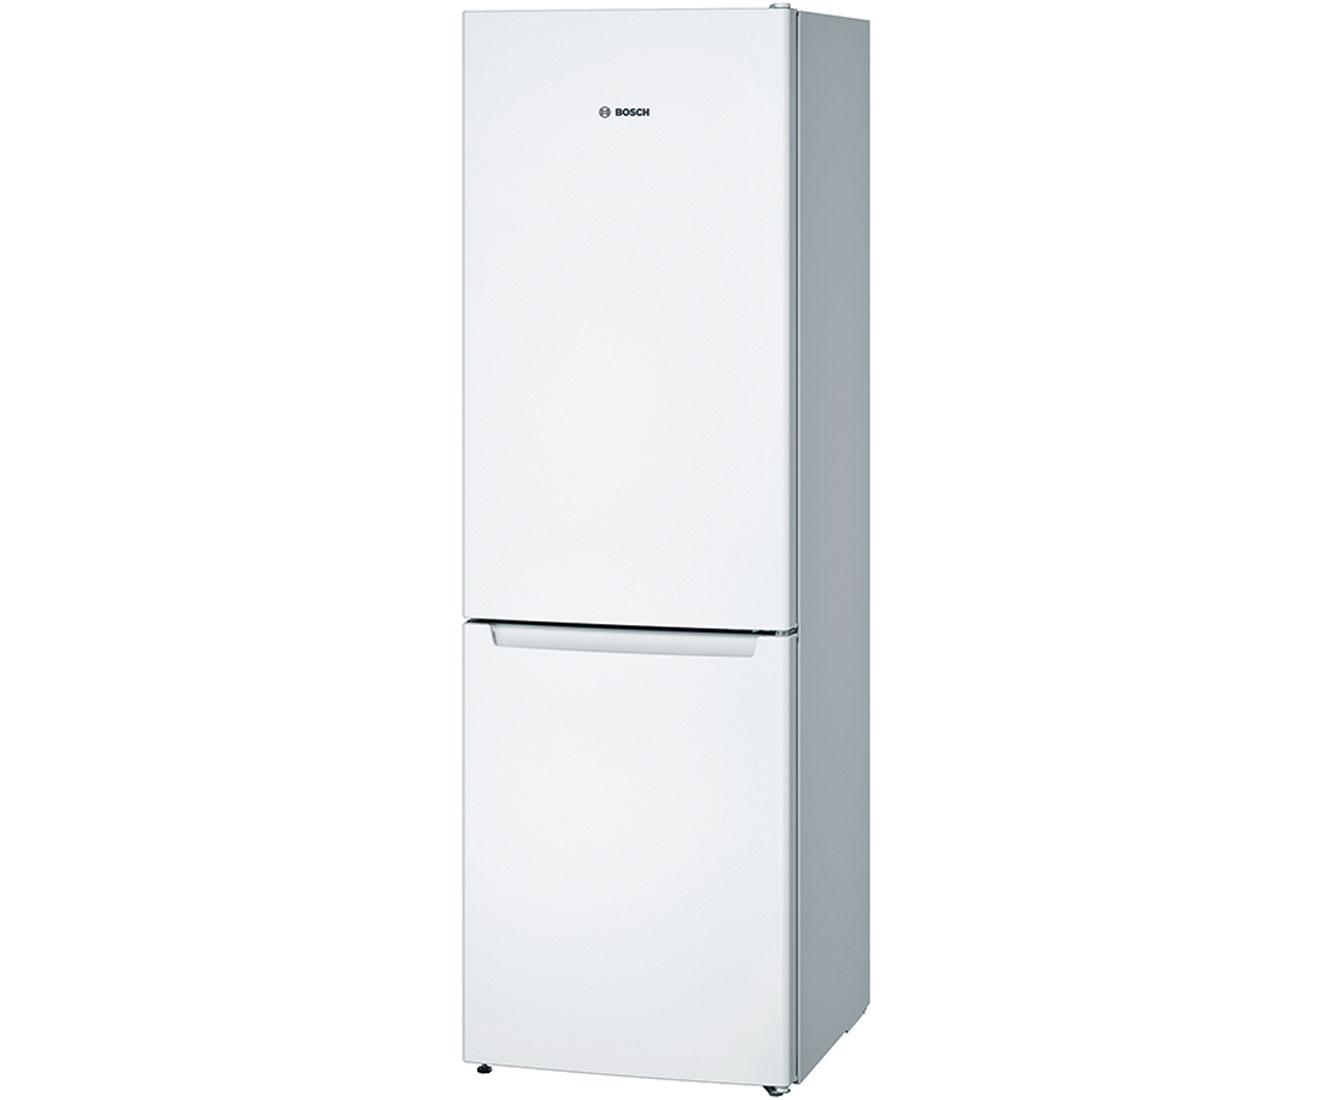 Bosch Kühlschrank Kgn 33 48 : Bosch kühlschrank kgn kühlschrank in niebüll ebay